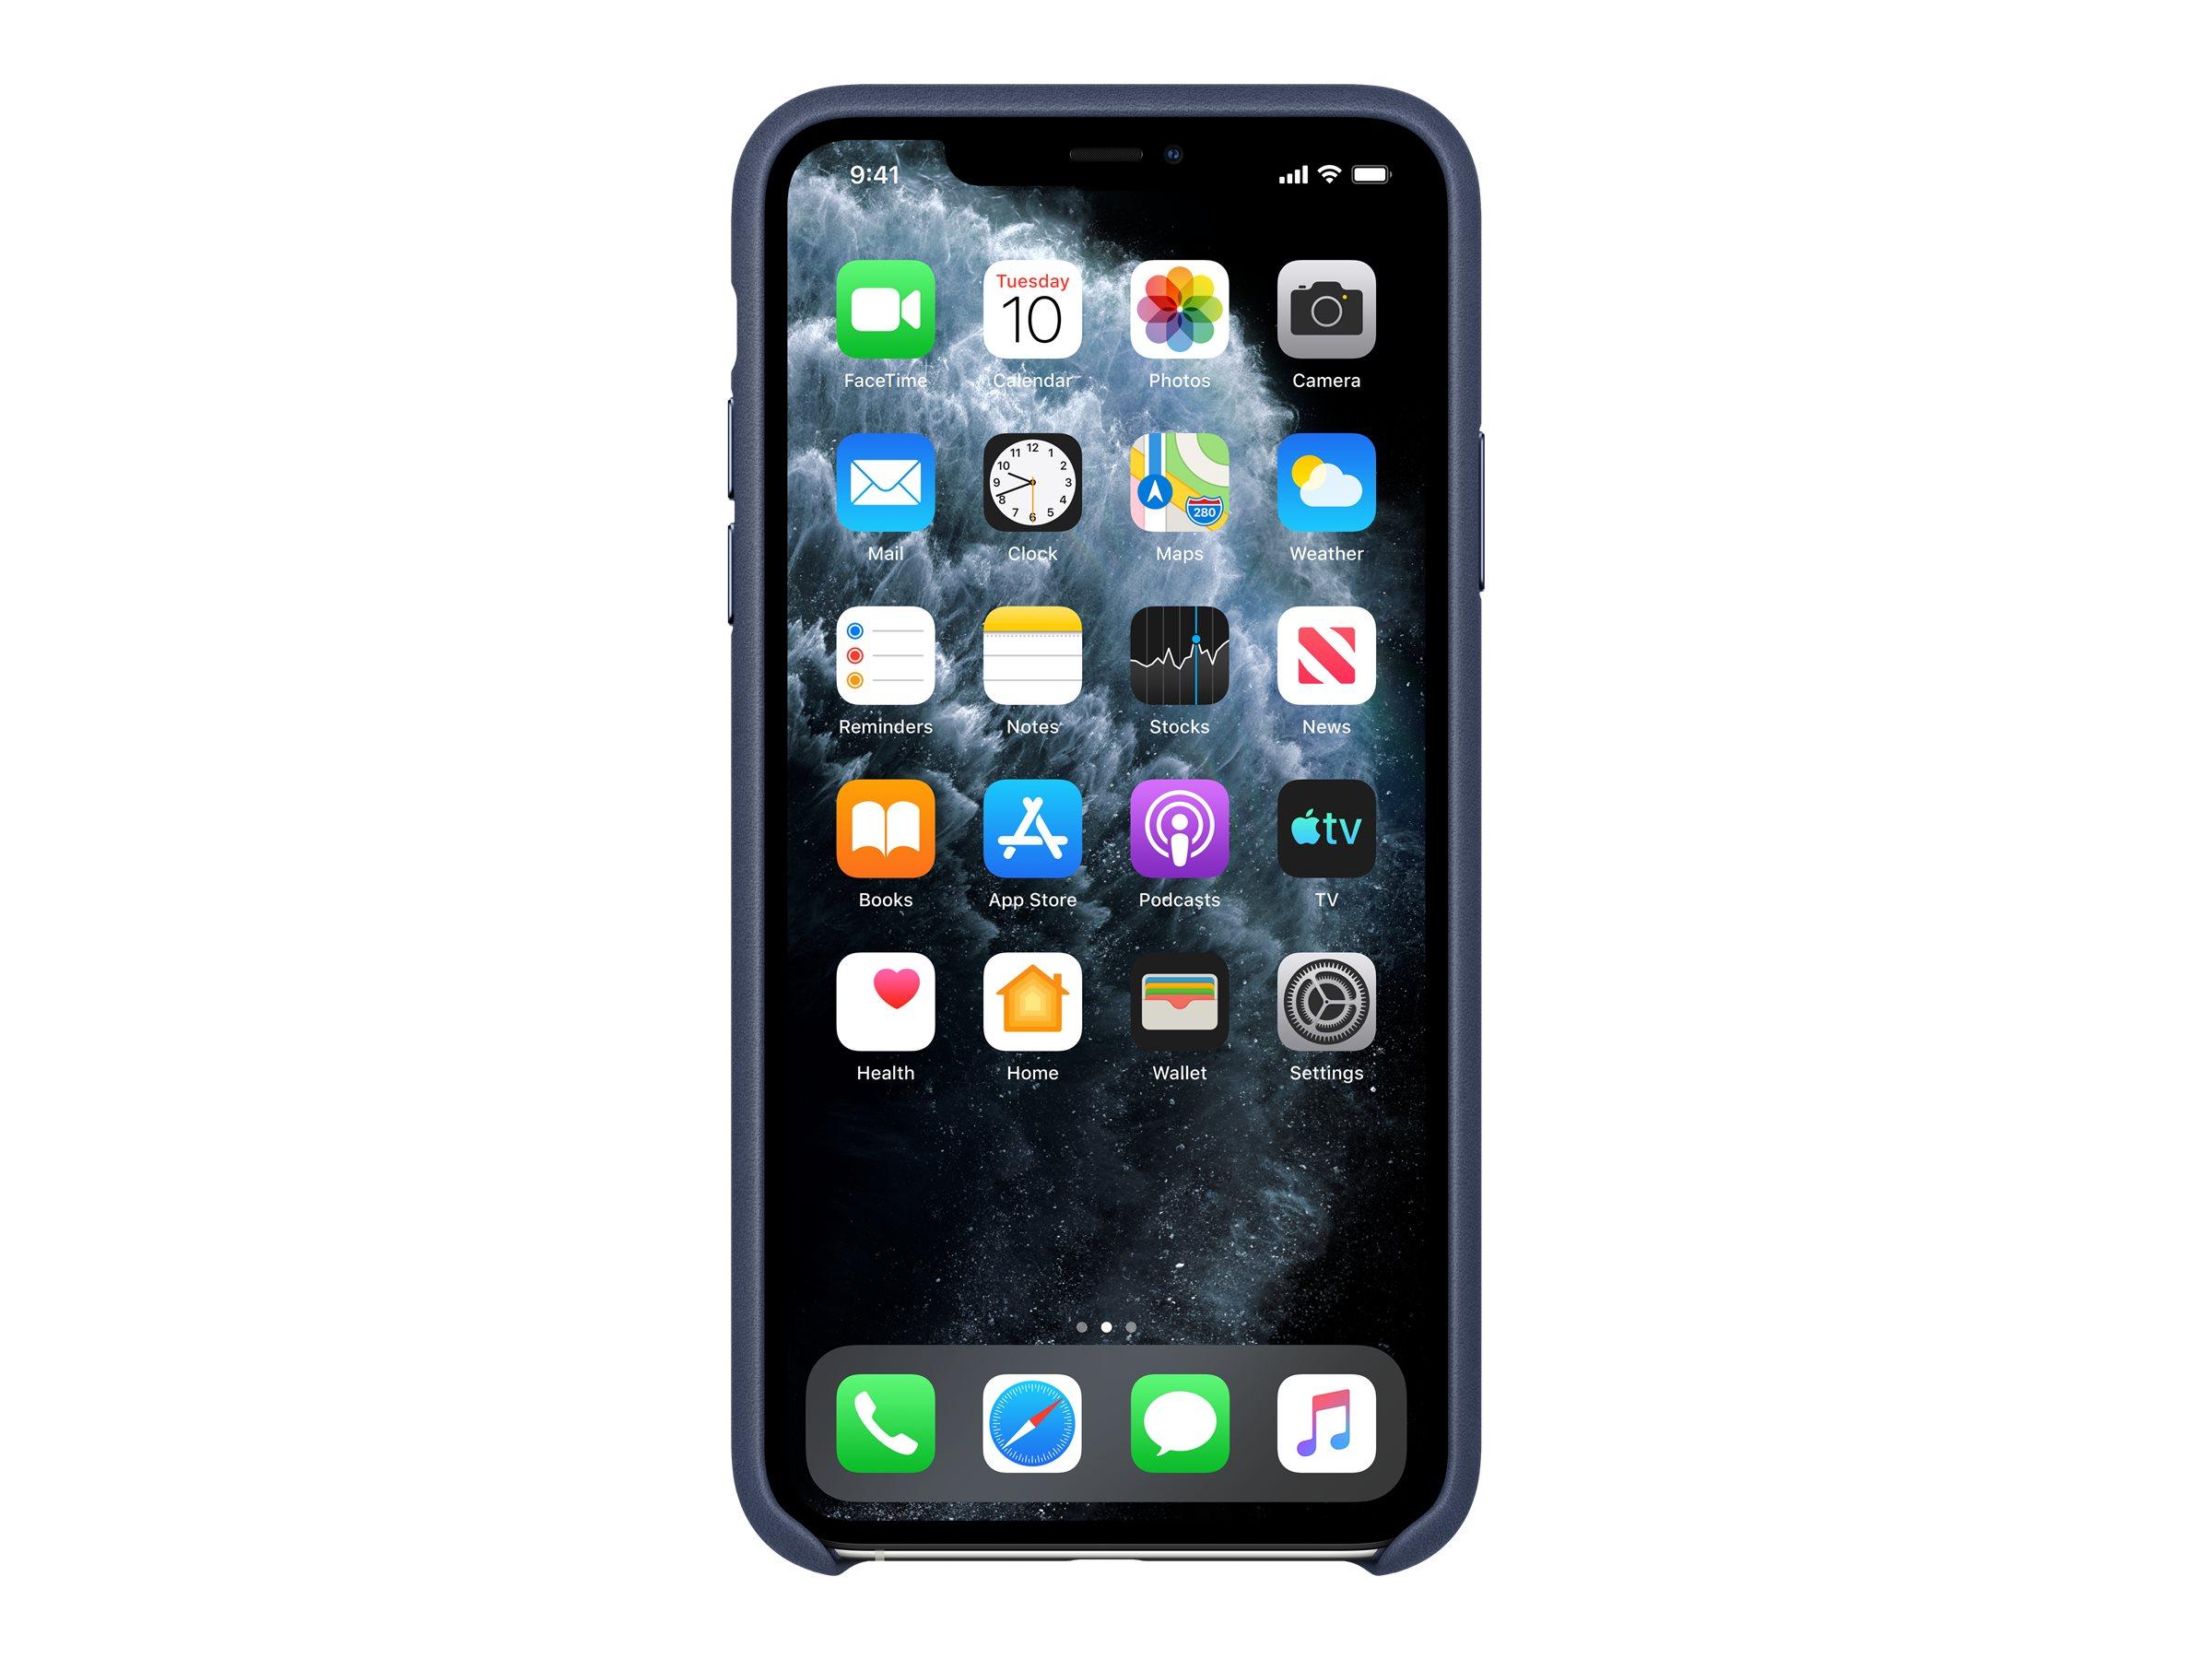 Hintere abdeckung fuer mobiltelefon leder bearbeitetes aluminium mitternachtsblau fuer iphone 11 pro max 11867108 mx0g2zm a